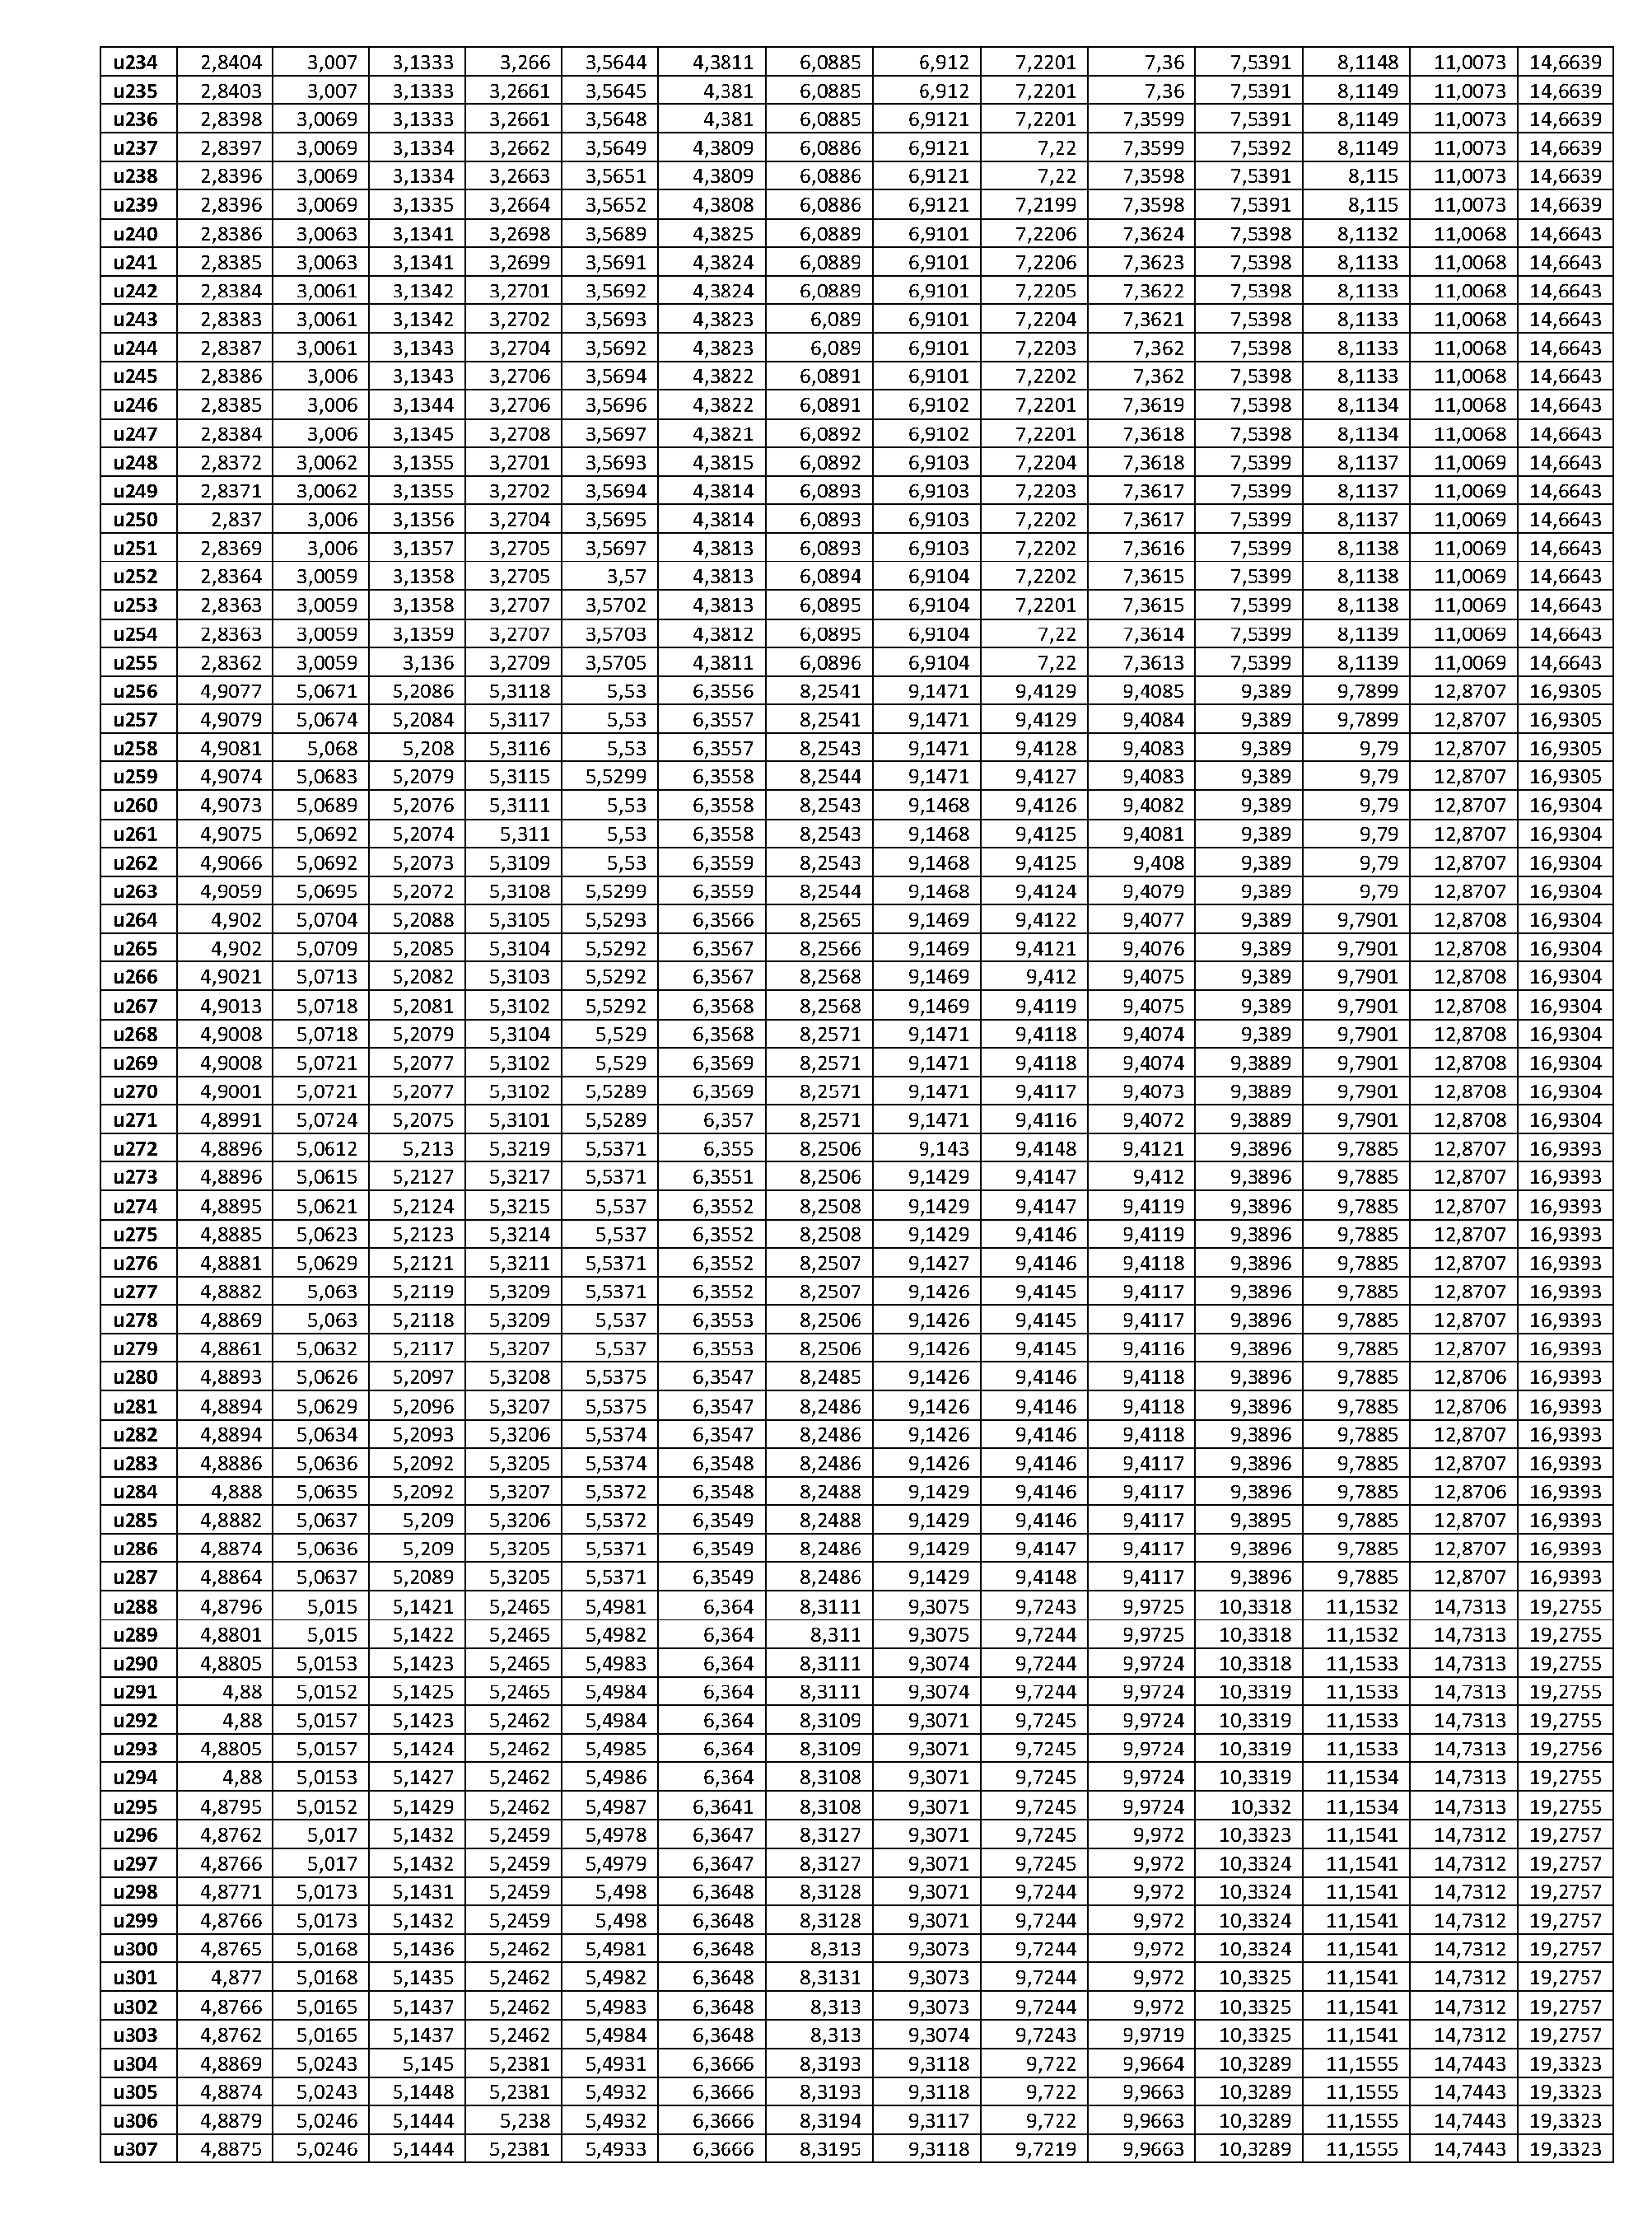 DE112013003443T5 - Coding and modulation device using a non-uniform ...